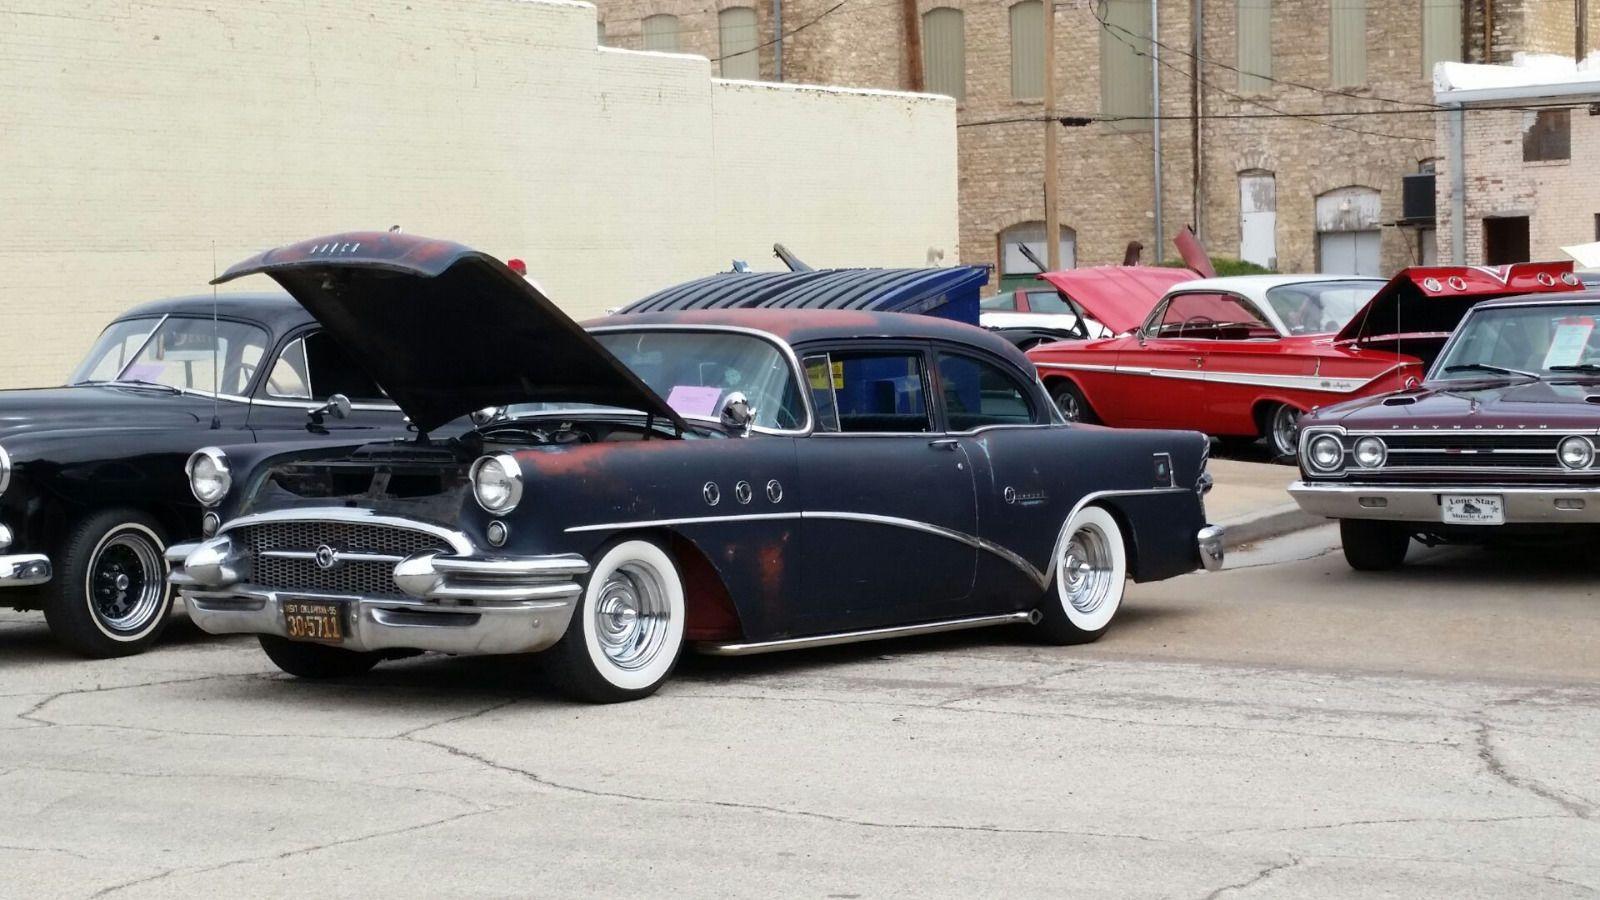 US $15,100.00 Used in eBay Motors, Cars & Trucks, Buick | Cars ...